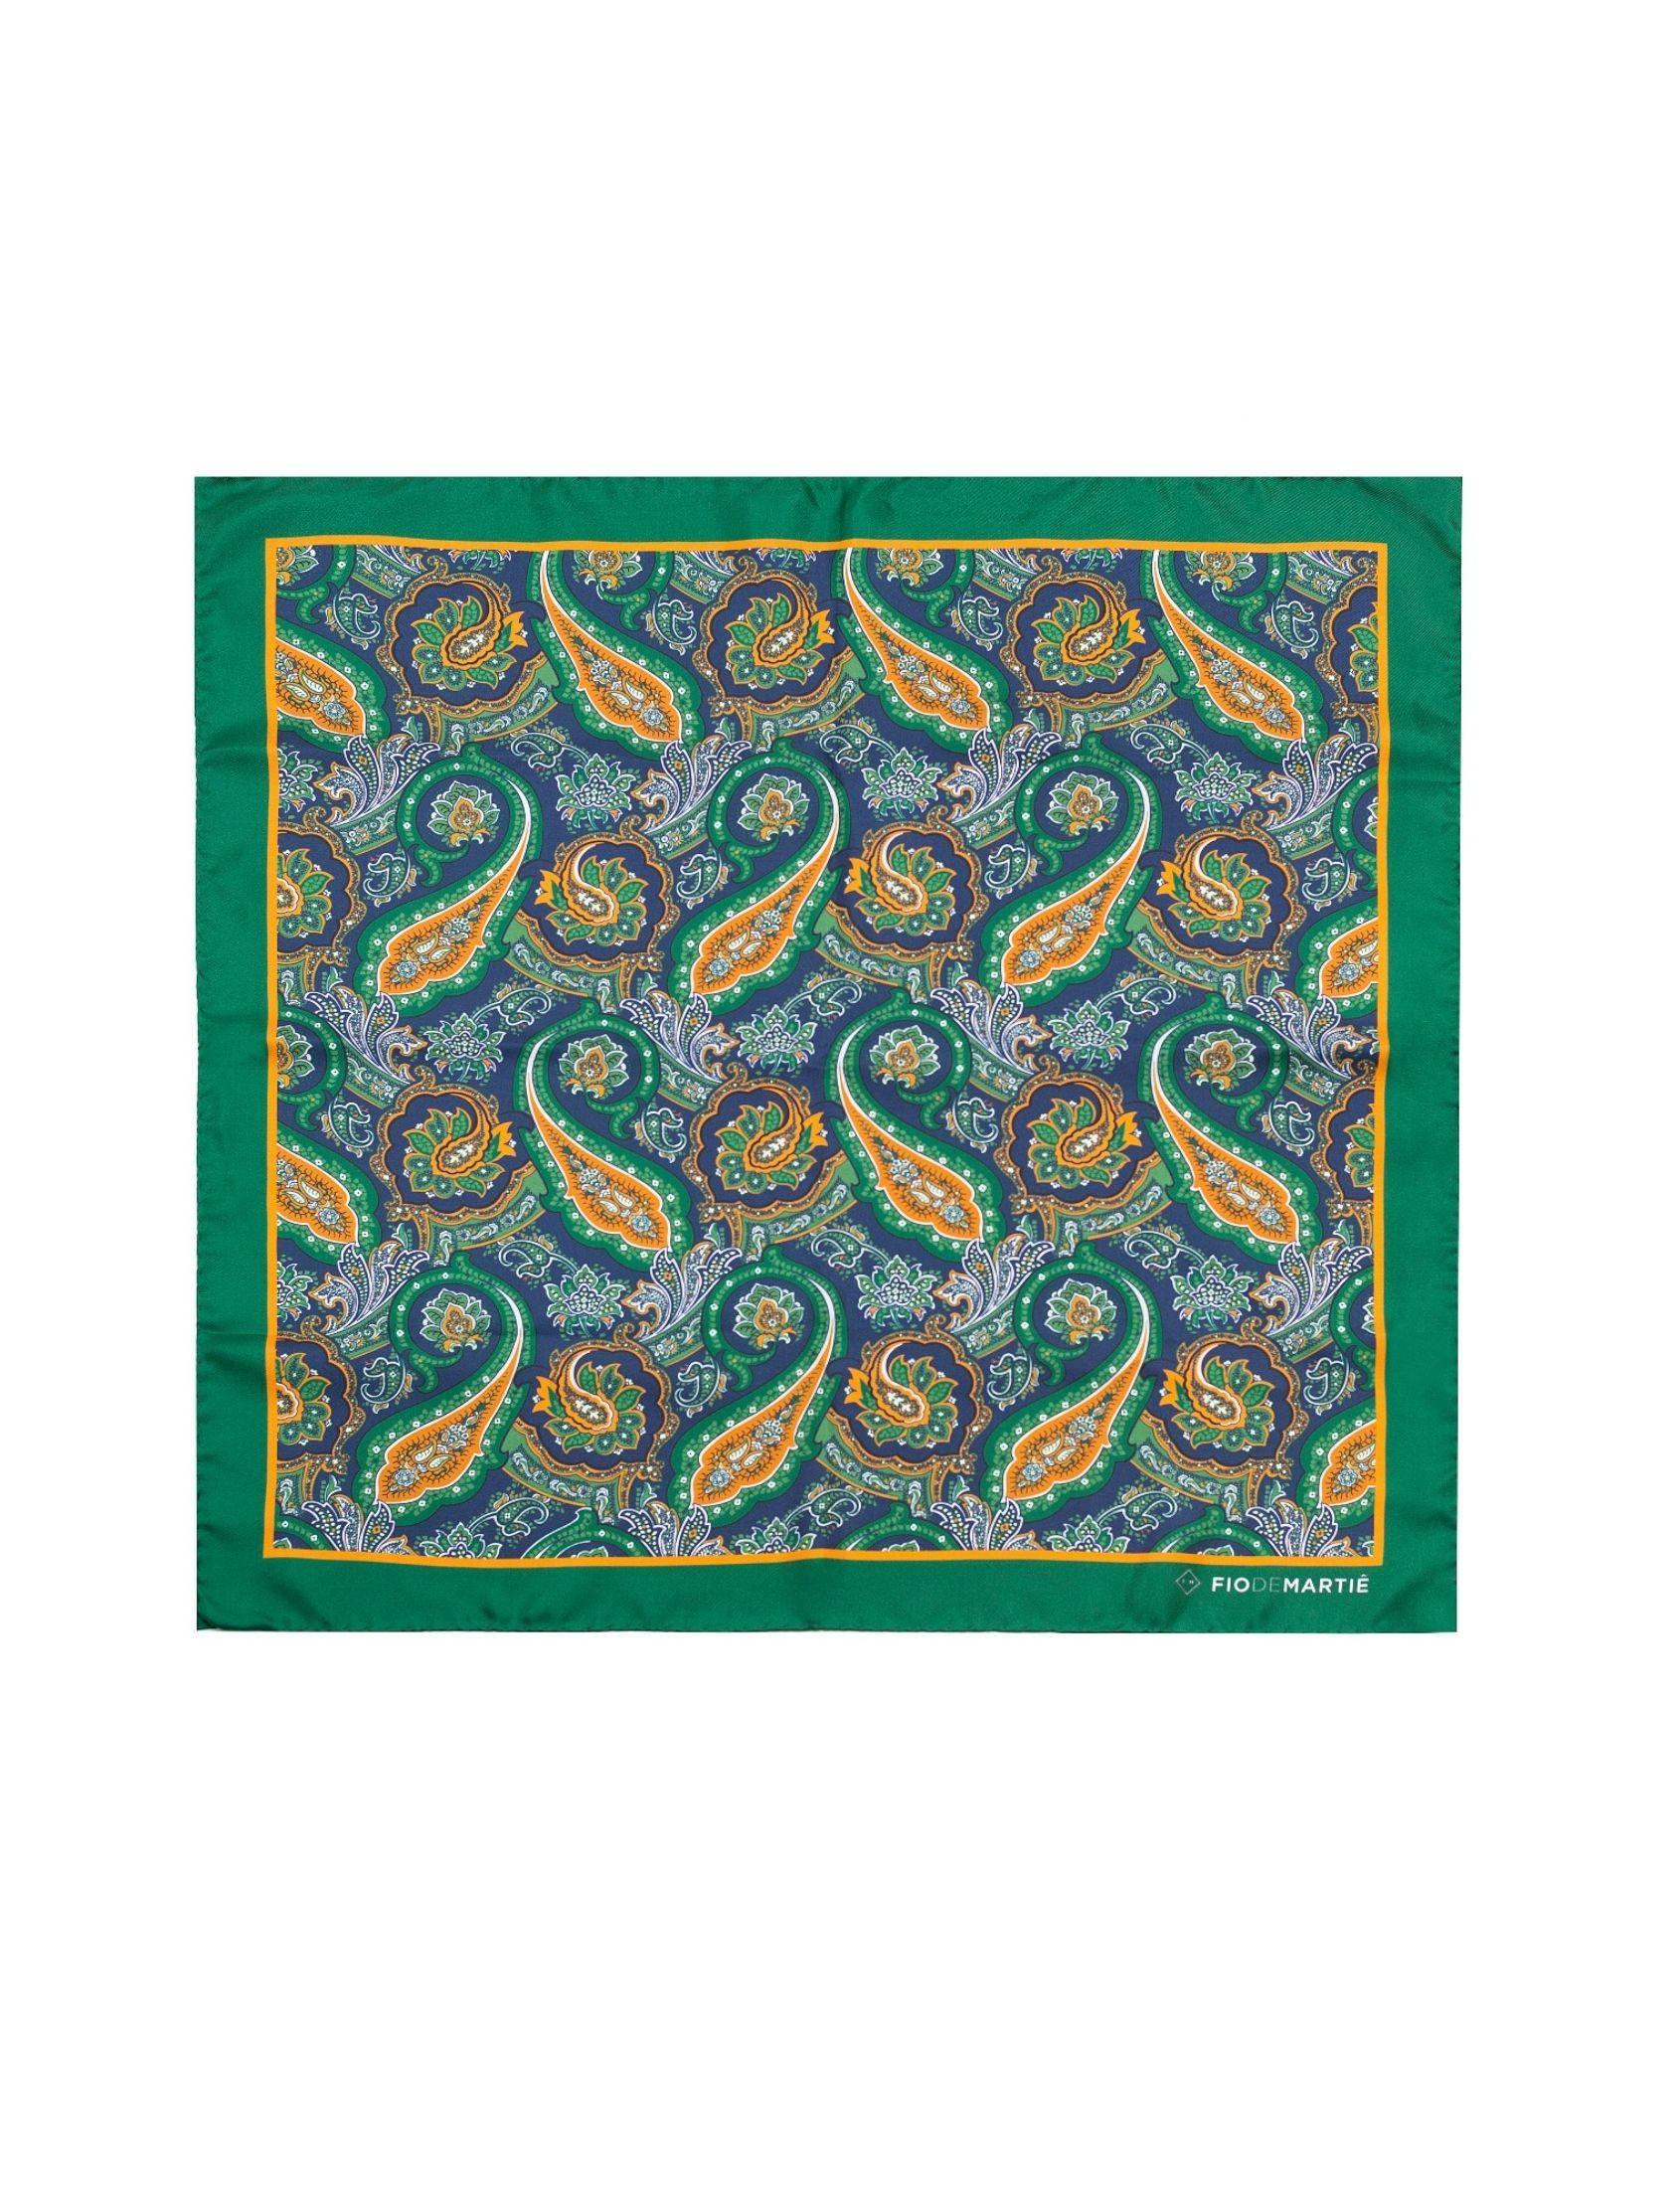 Pañuelo seda mujer estampado cashemere Sierra Calderona con fondo verde